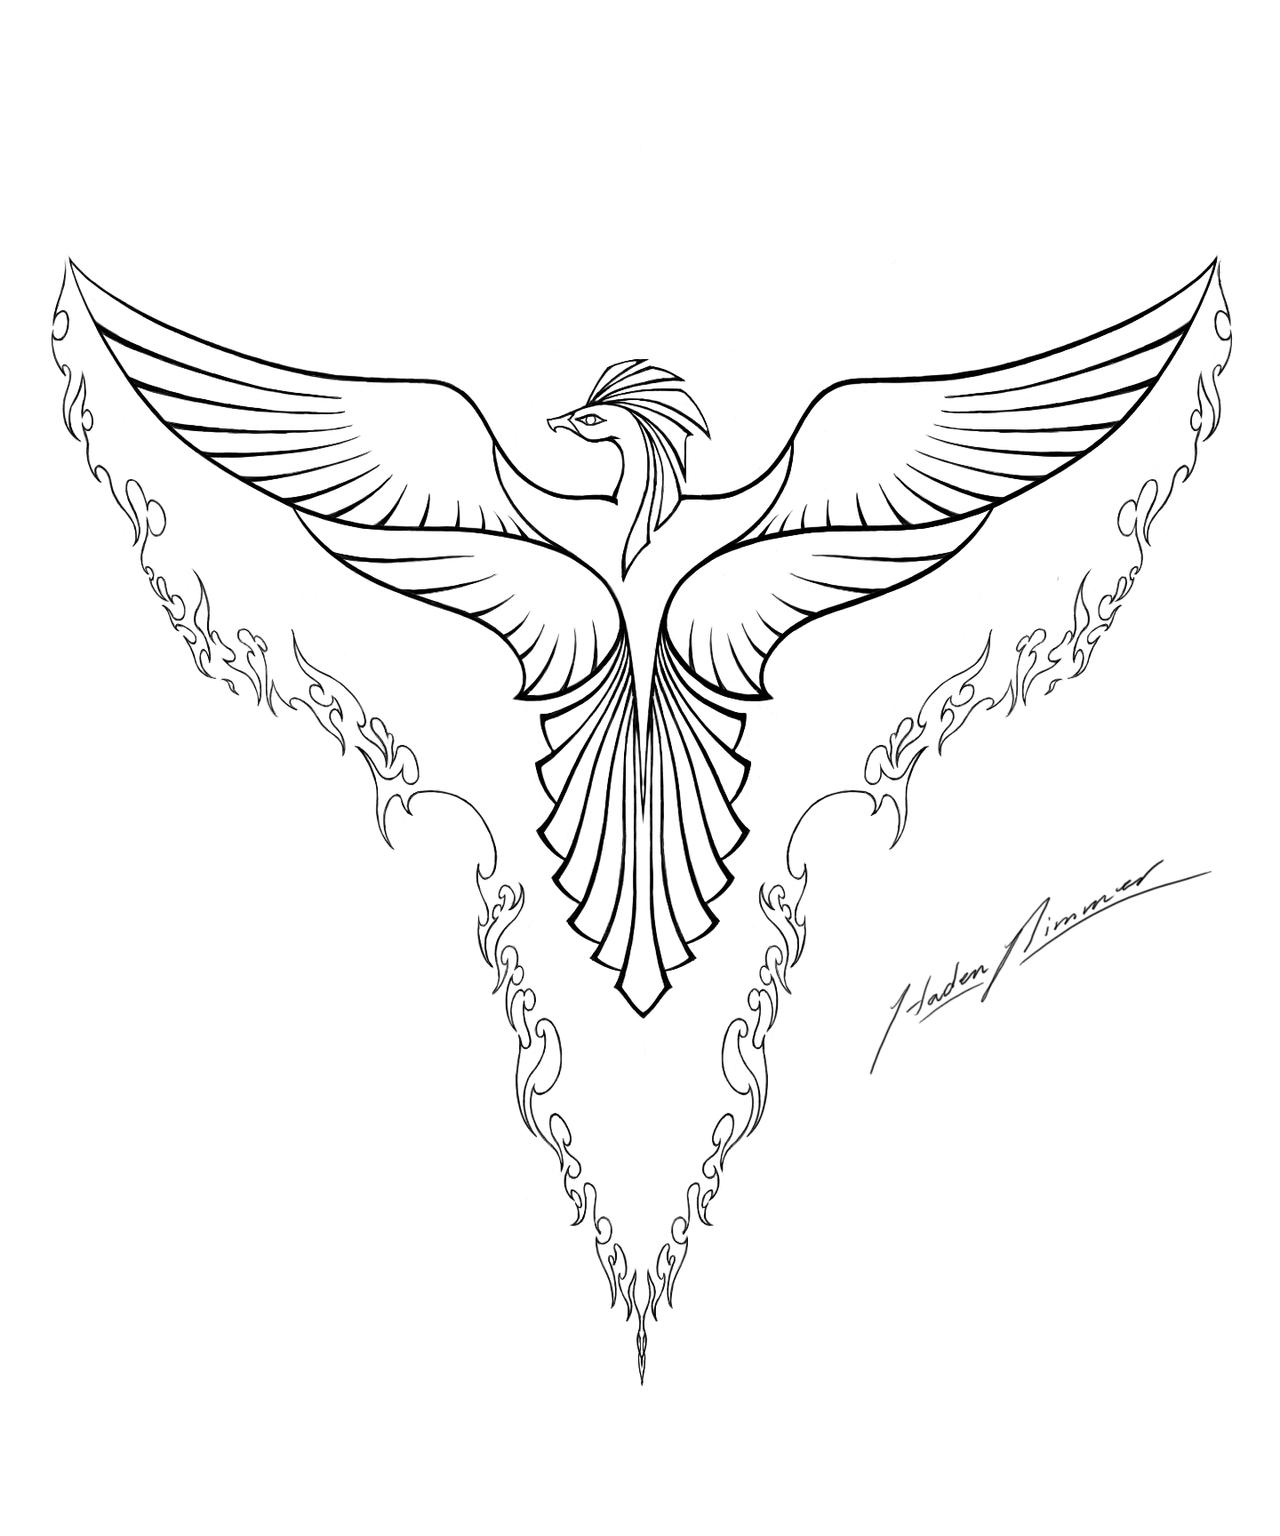 Coloring Lineart : Phoenix lineart by hadenjax on deviantart